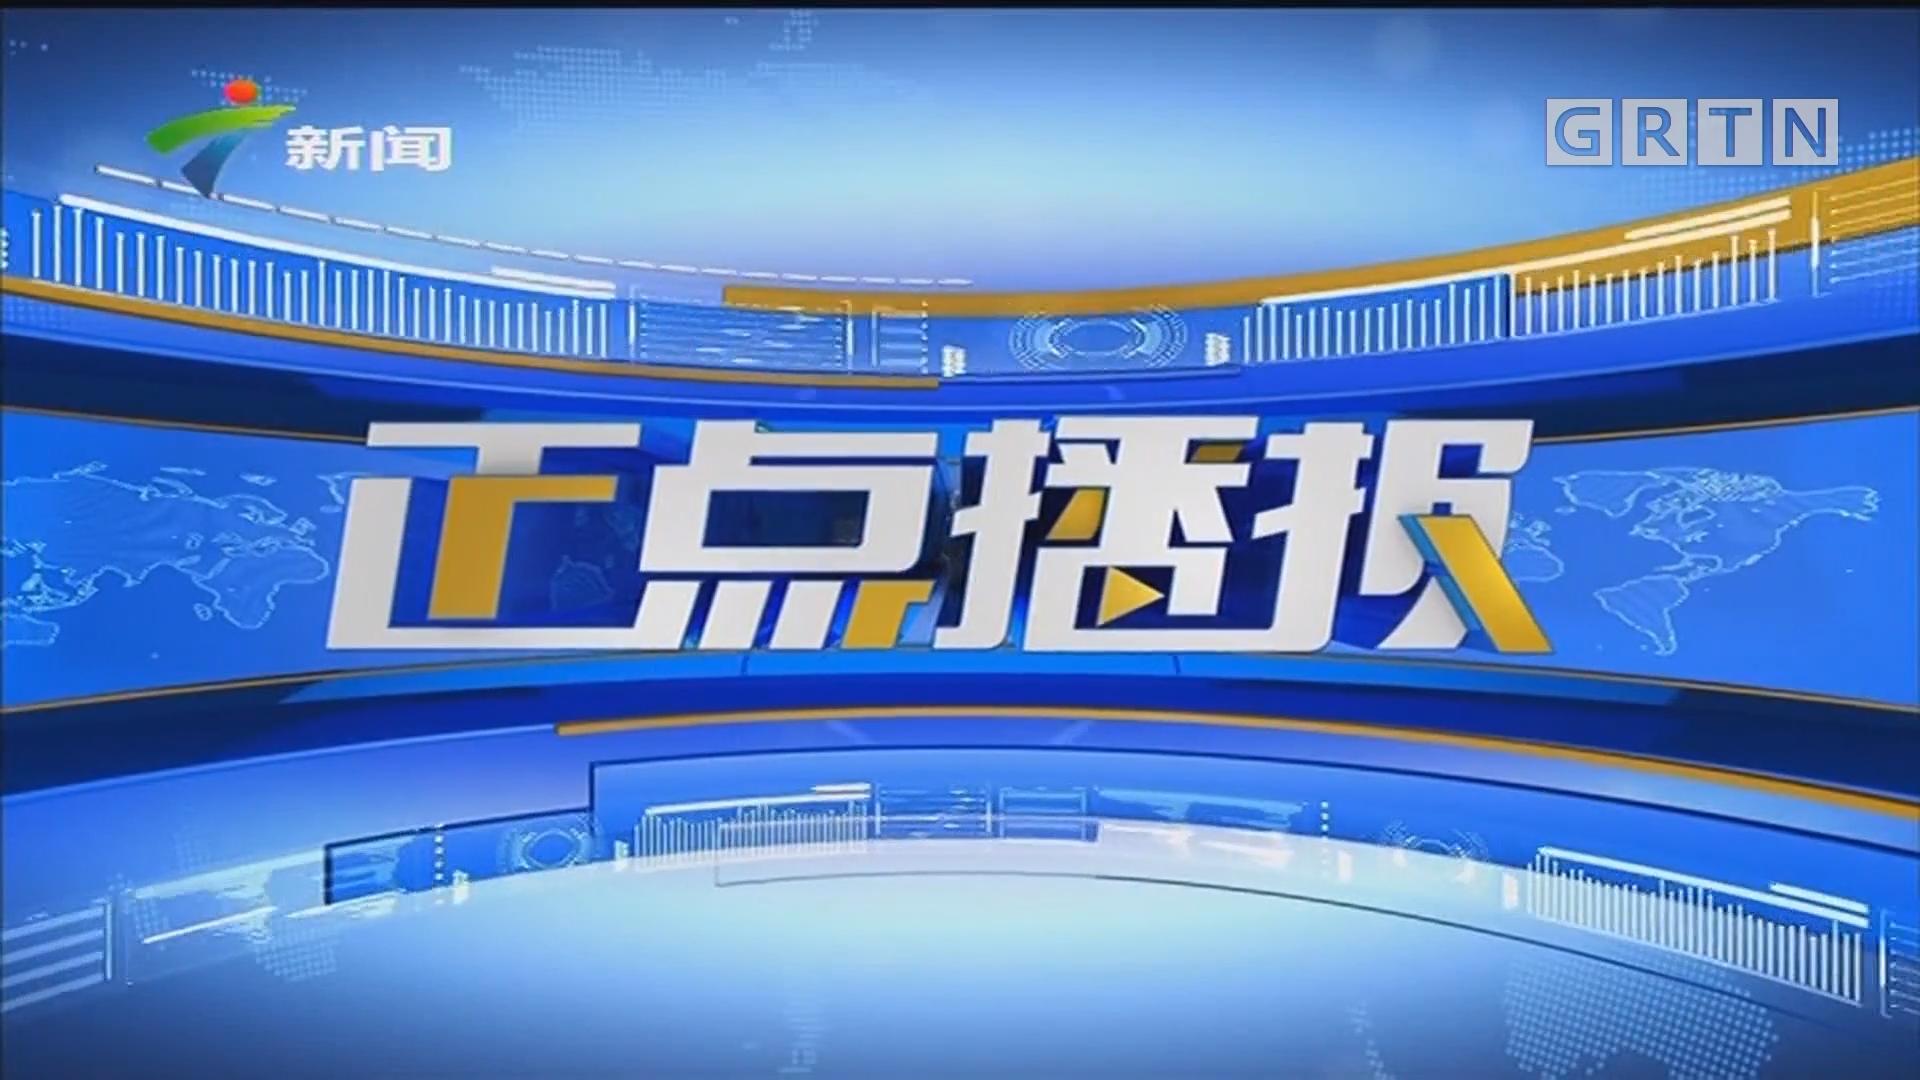 [HD][2019-10-19]正点播报:第七届世界军人运动会在武汉隆重开幕 习近平出席开幕式并宣布运动会开幕